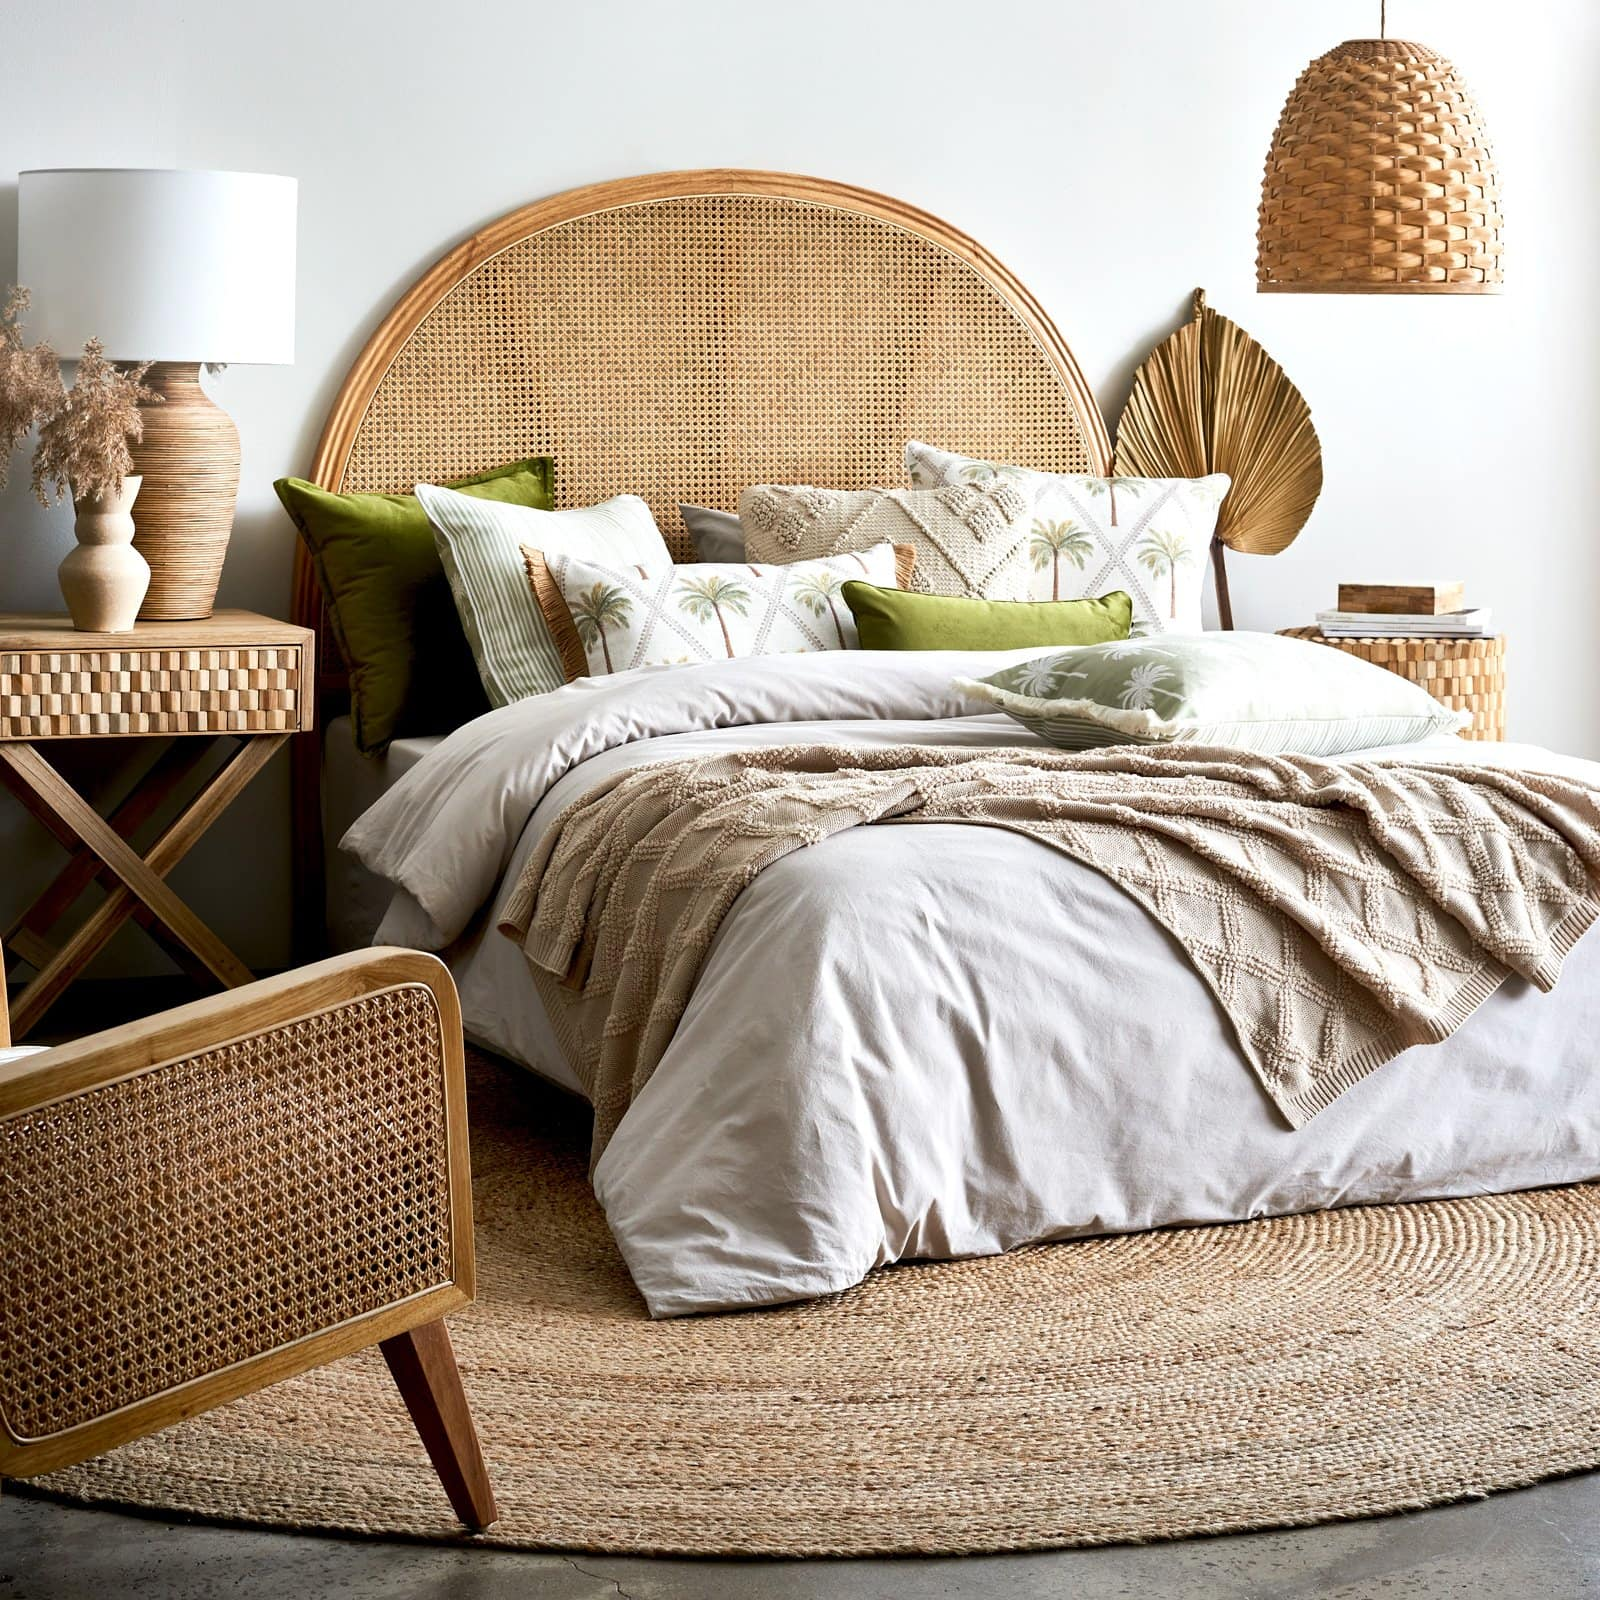 large round jute rug under rattan bed in bedroom